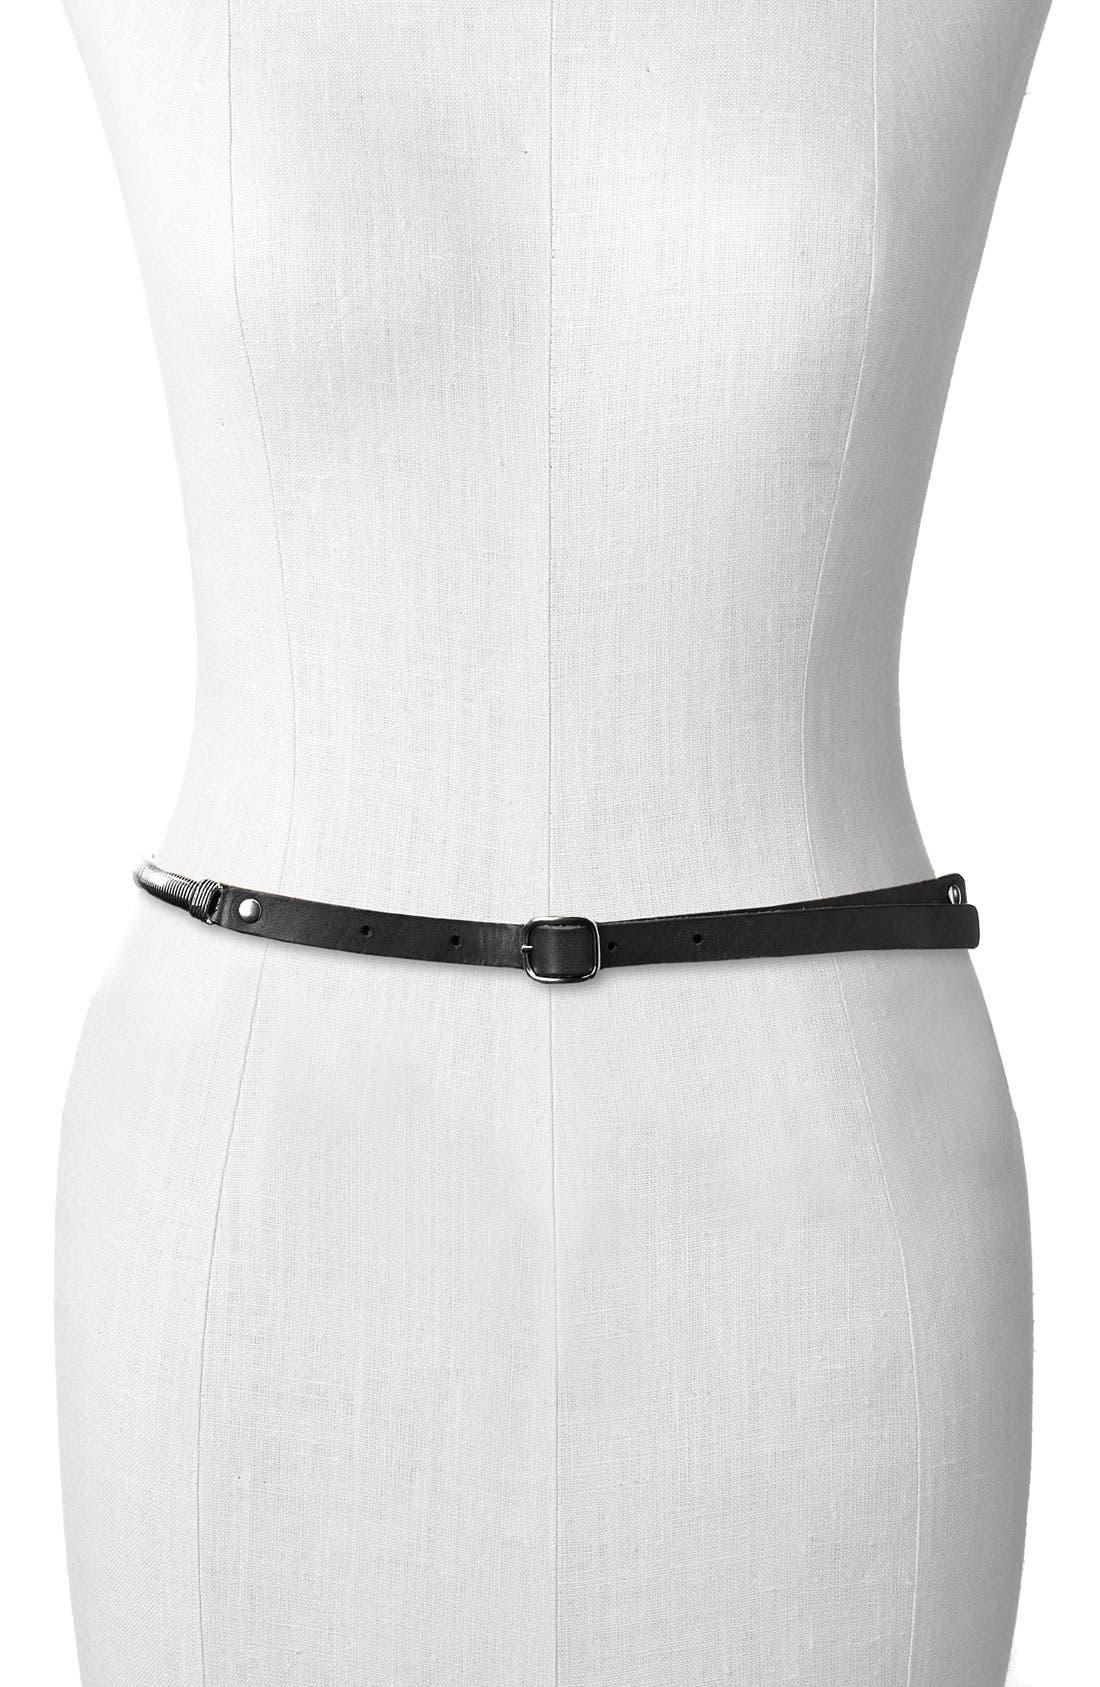 Alternate Image 1 Selected - Belgo Lux 'Metal Stretch' Skinny Belt